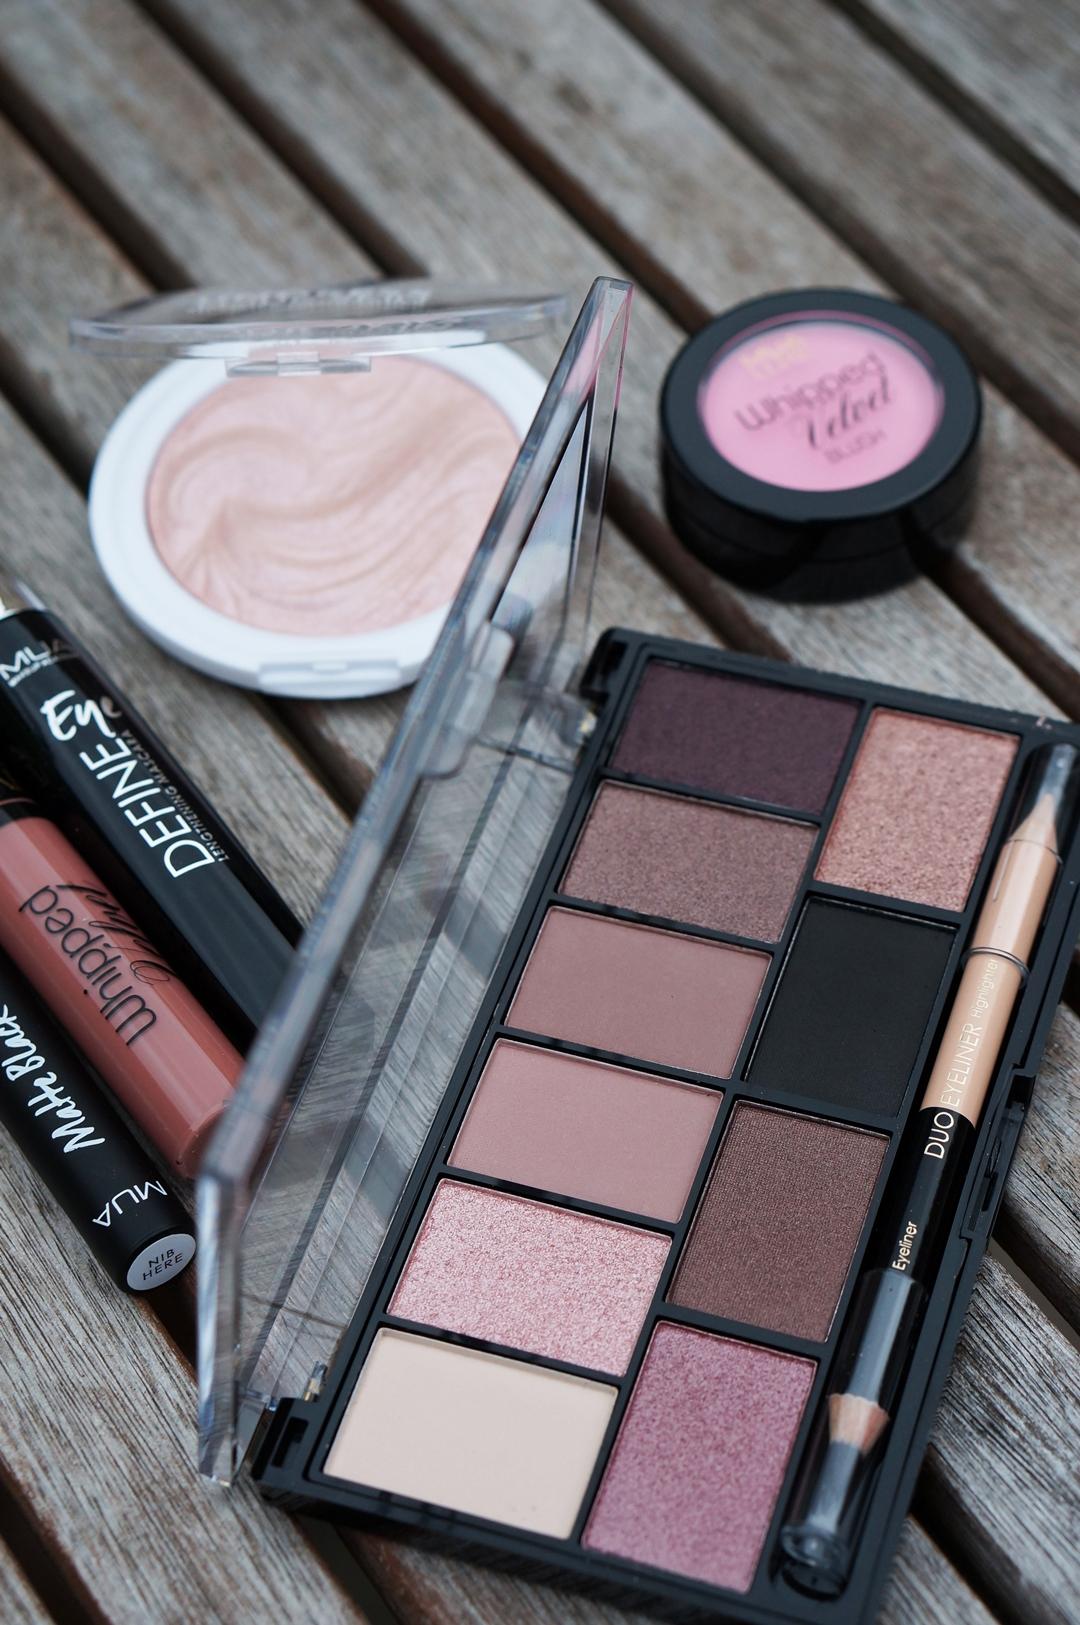 WIN MUA Ethereal Look make-up set